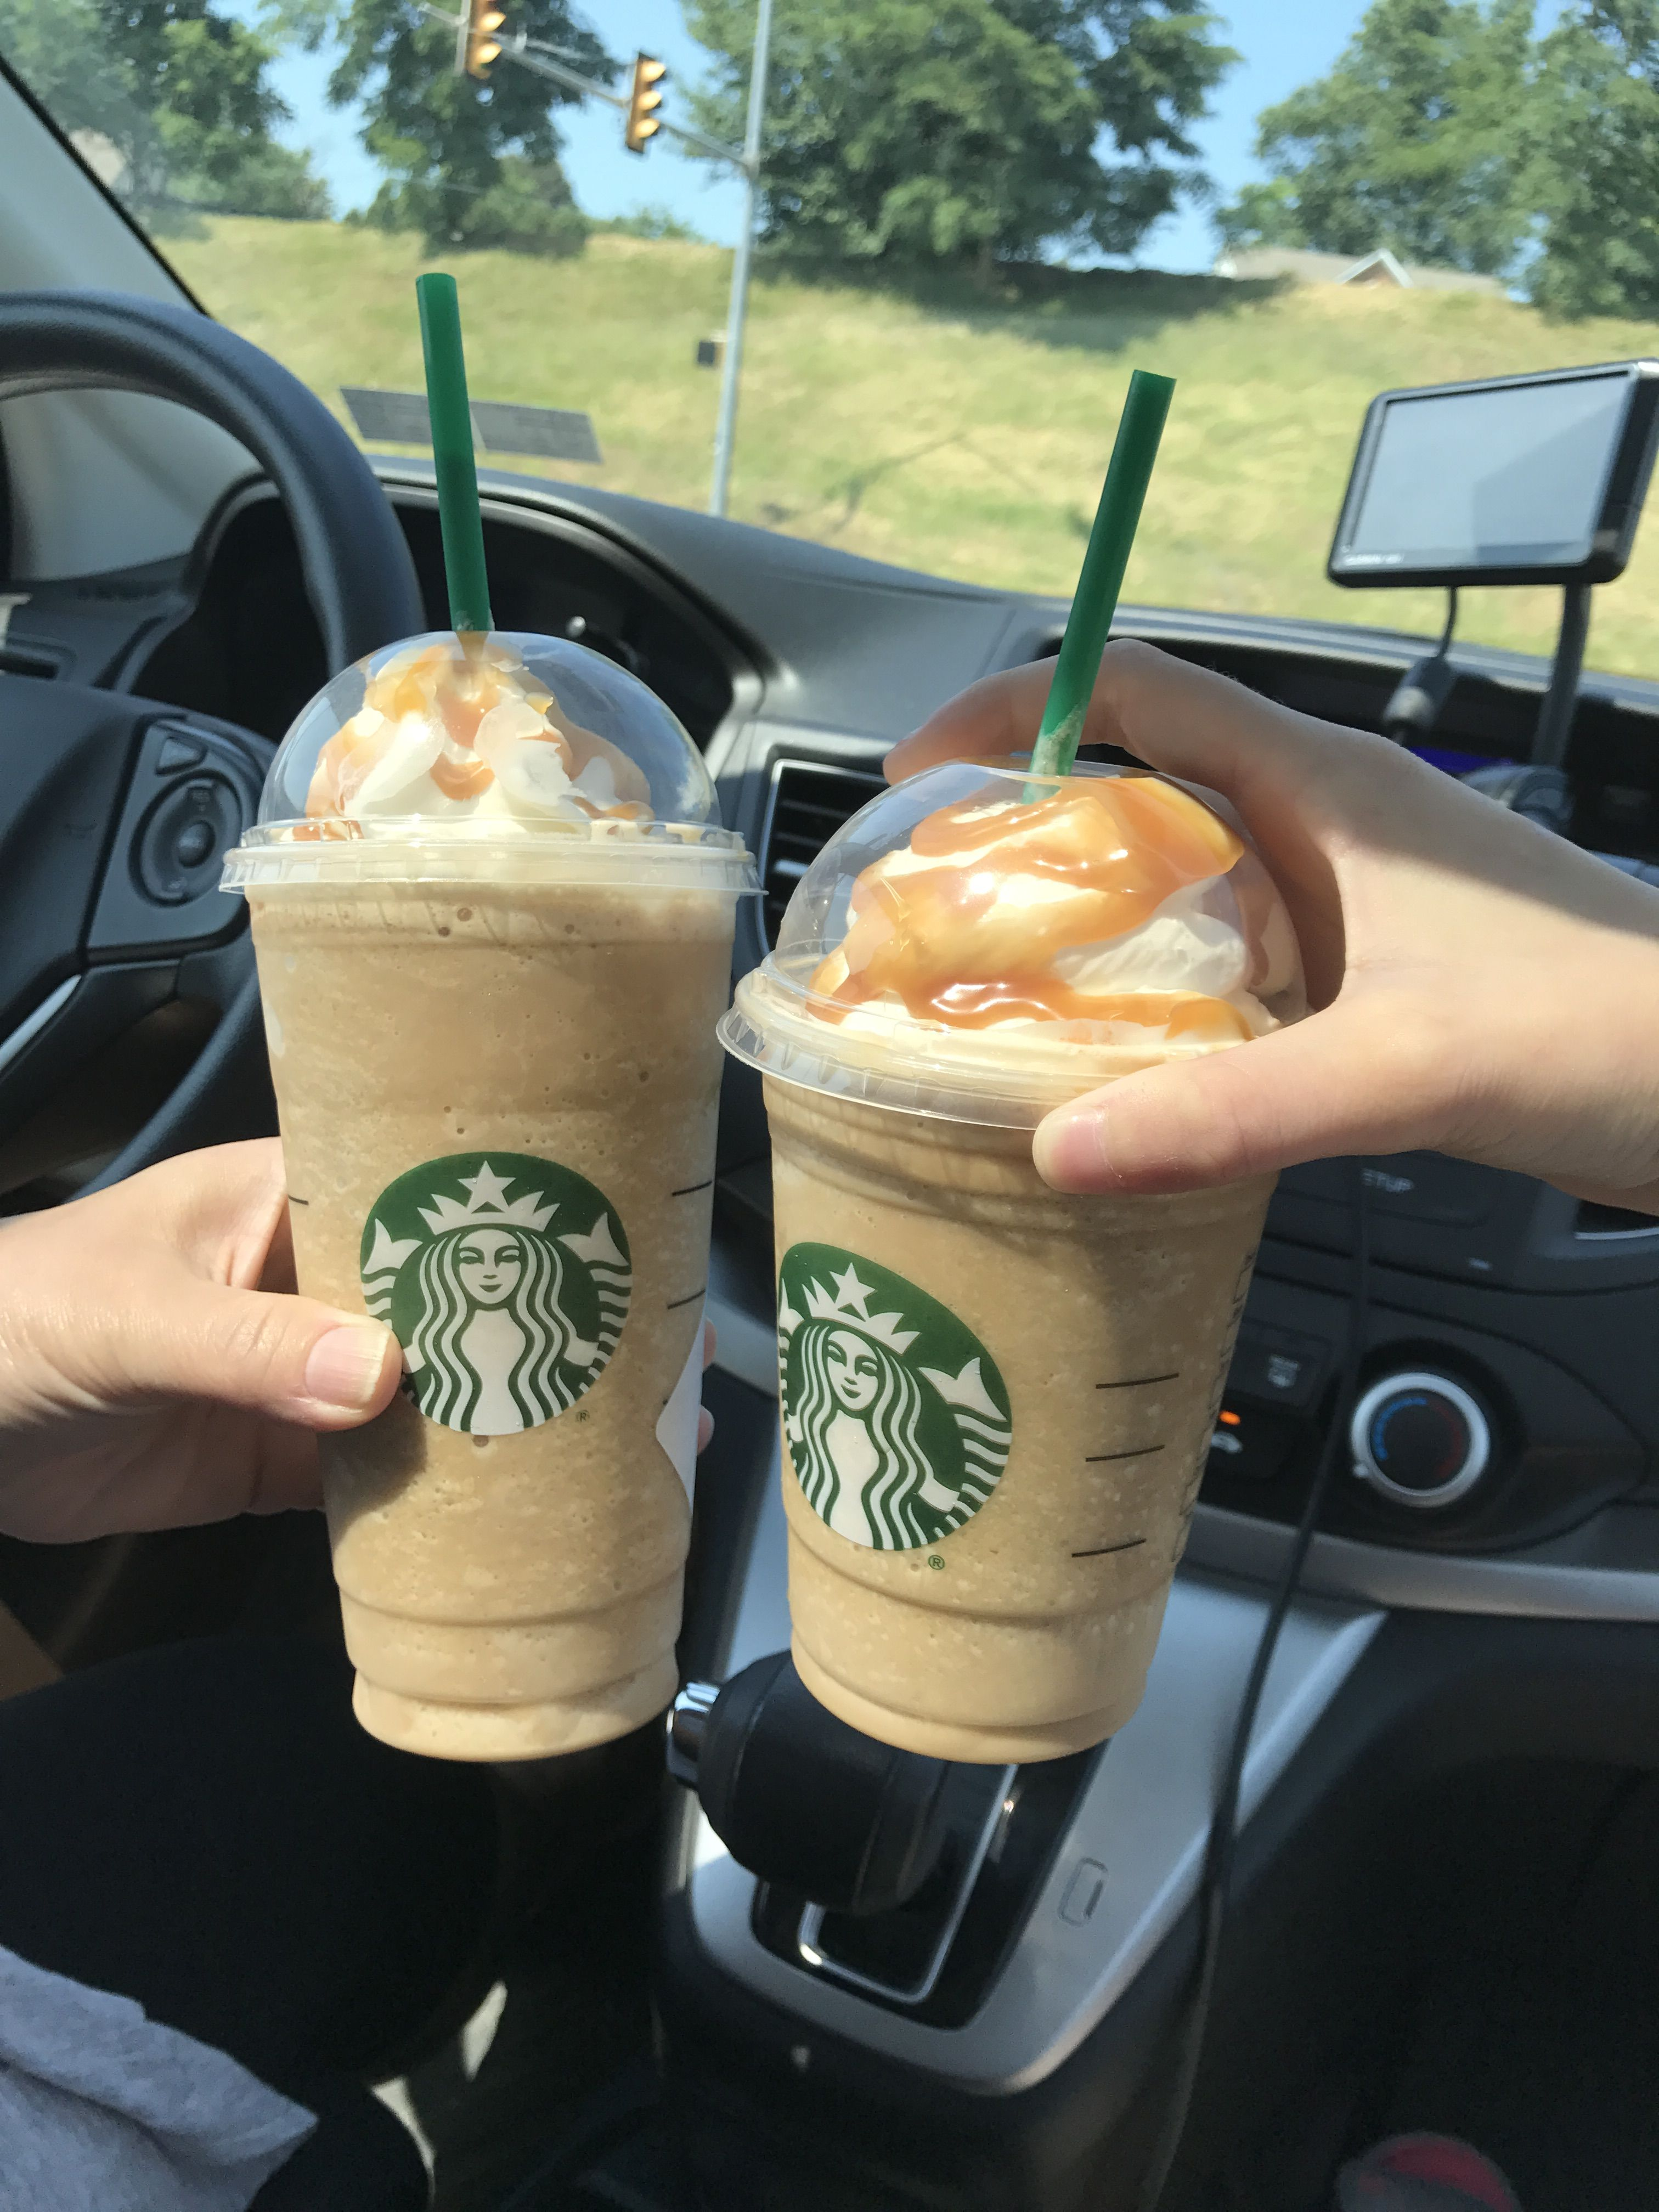 Starbucks Starbucks recipes, Starbucks drinks recipes